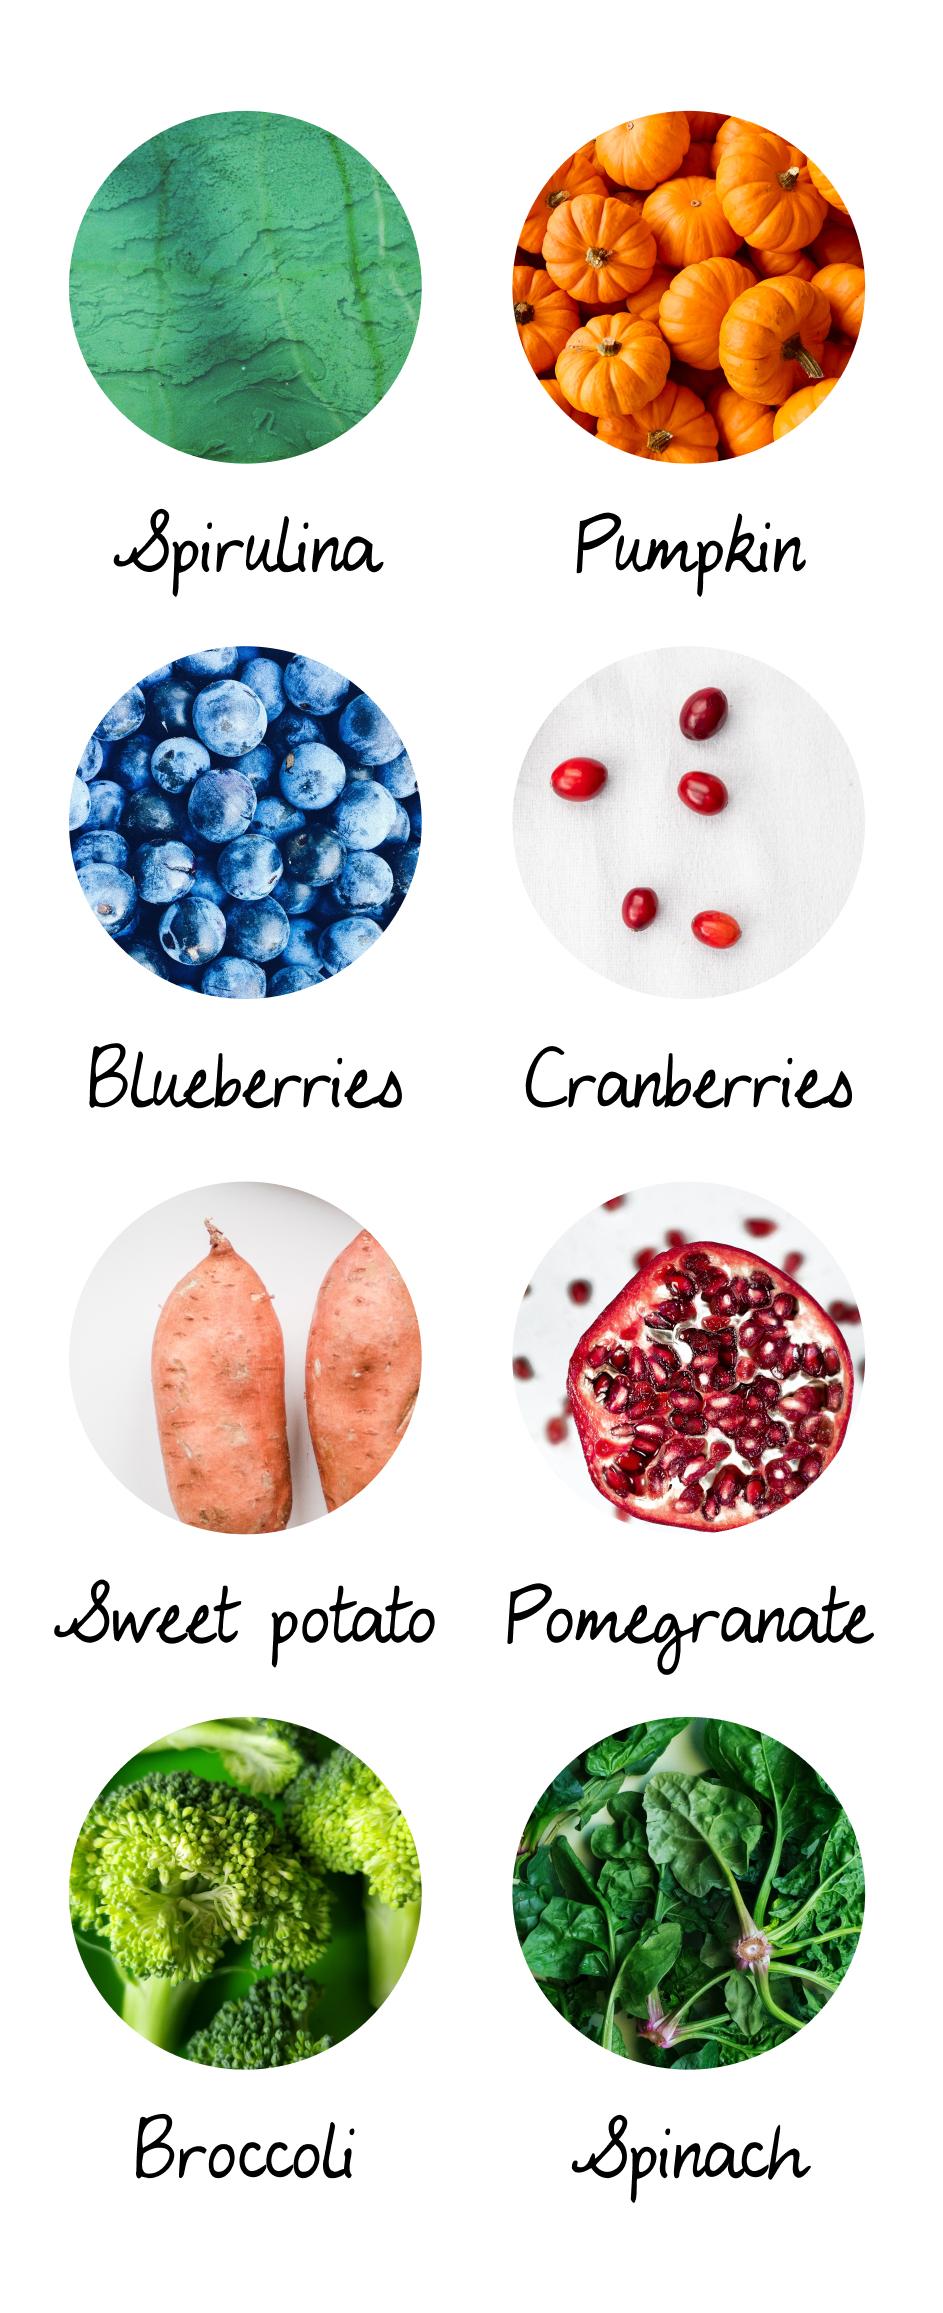 A list of superfood: spirulina, pumpkin, blueberries, cranberries, sweet potato, pomegranate, broccoli, spinach